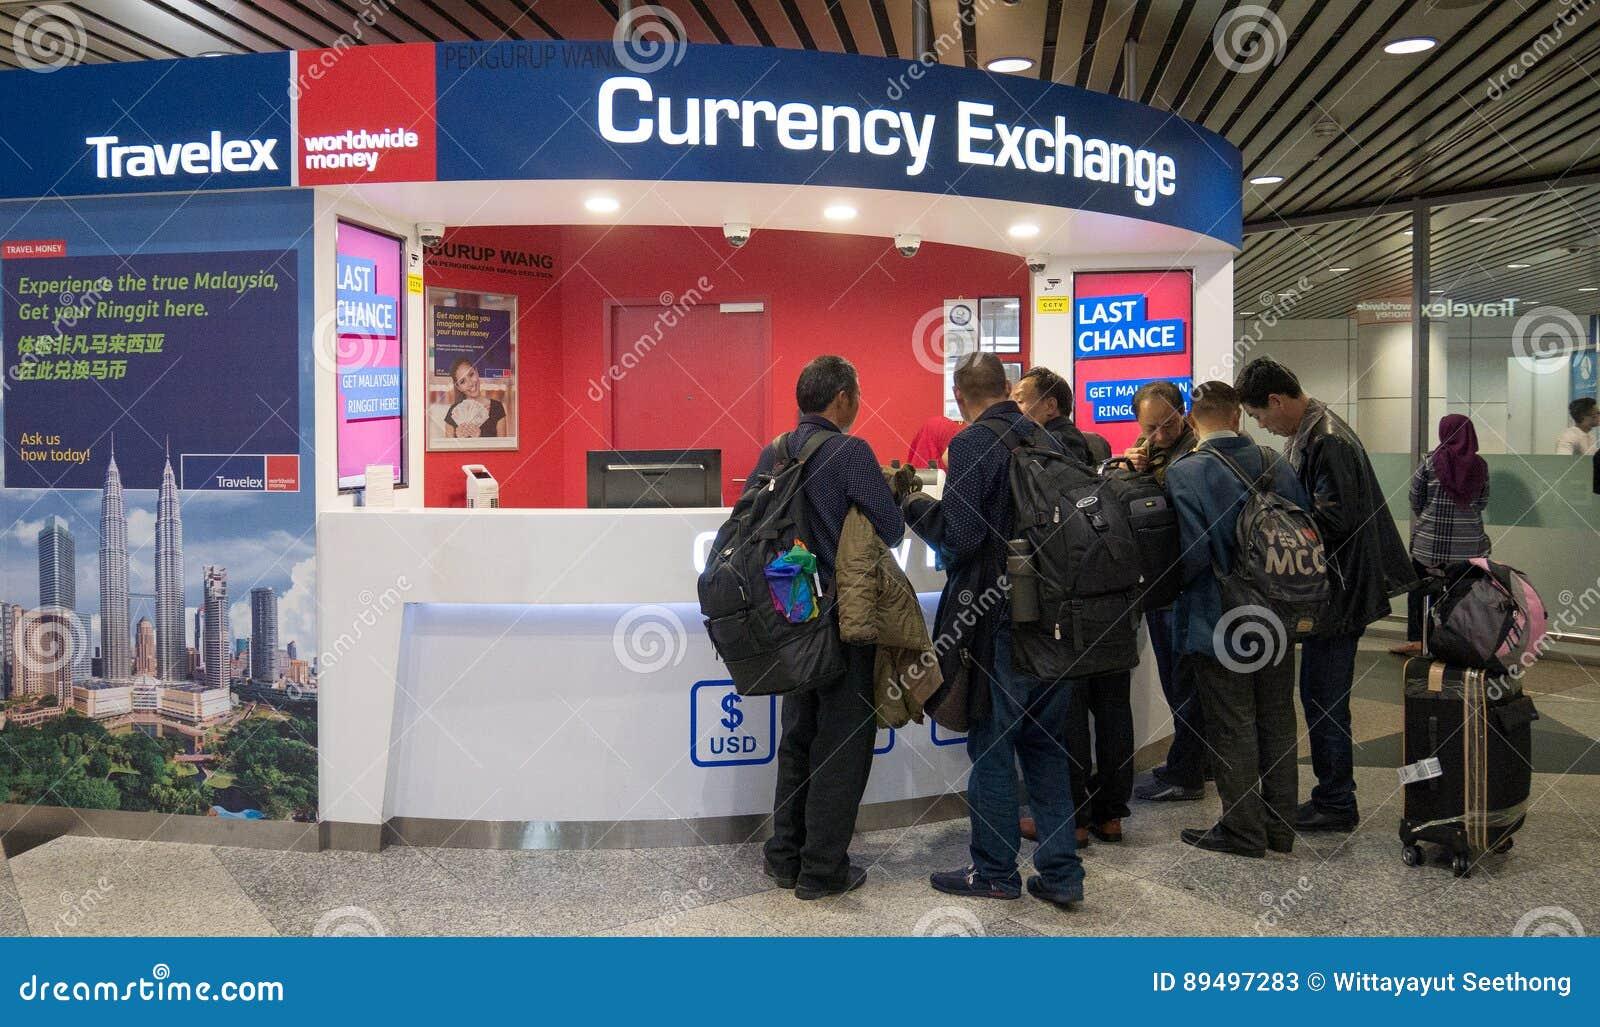 Travelex Currency Exchange Couter  Money Exchange Shop In